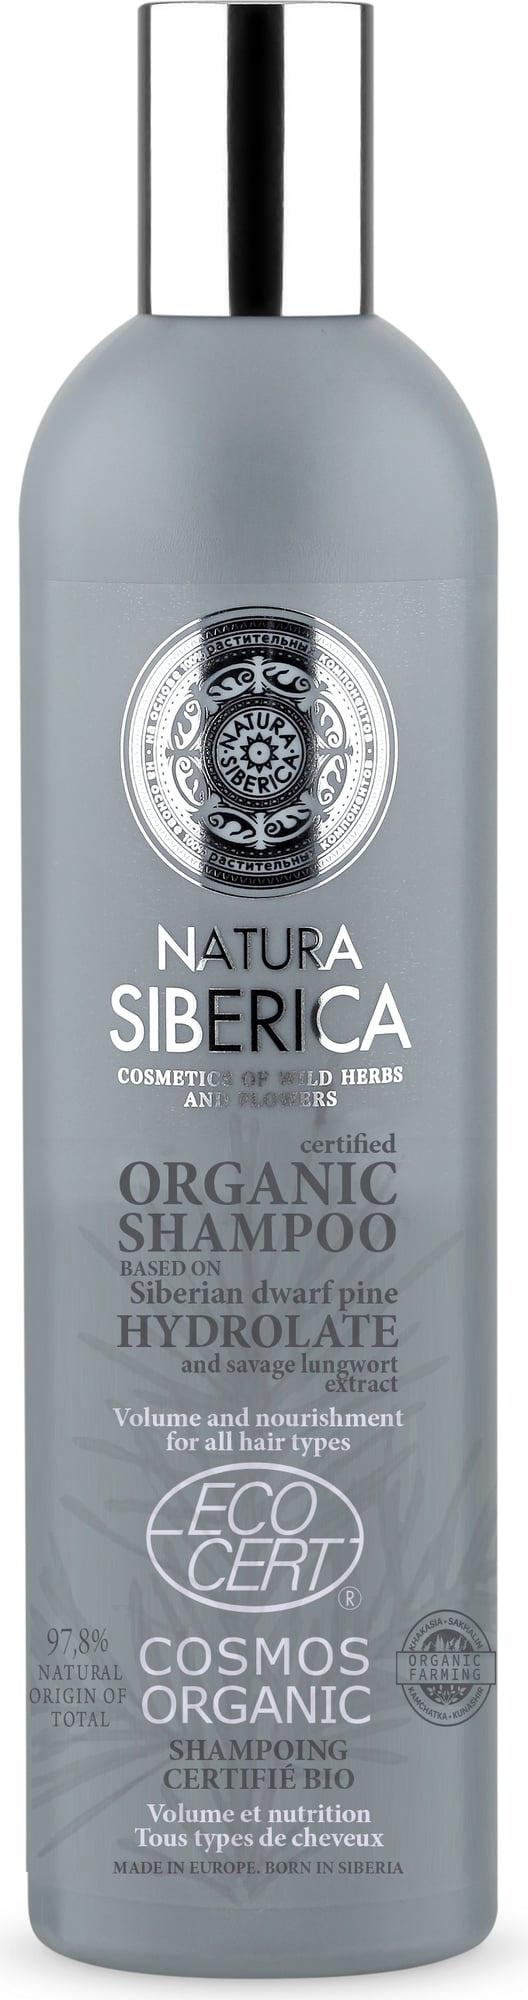 Natura Siberica Volume And Nourishment Shampoo